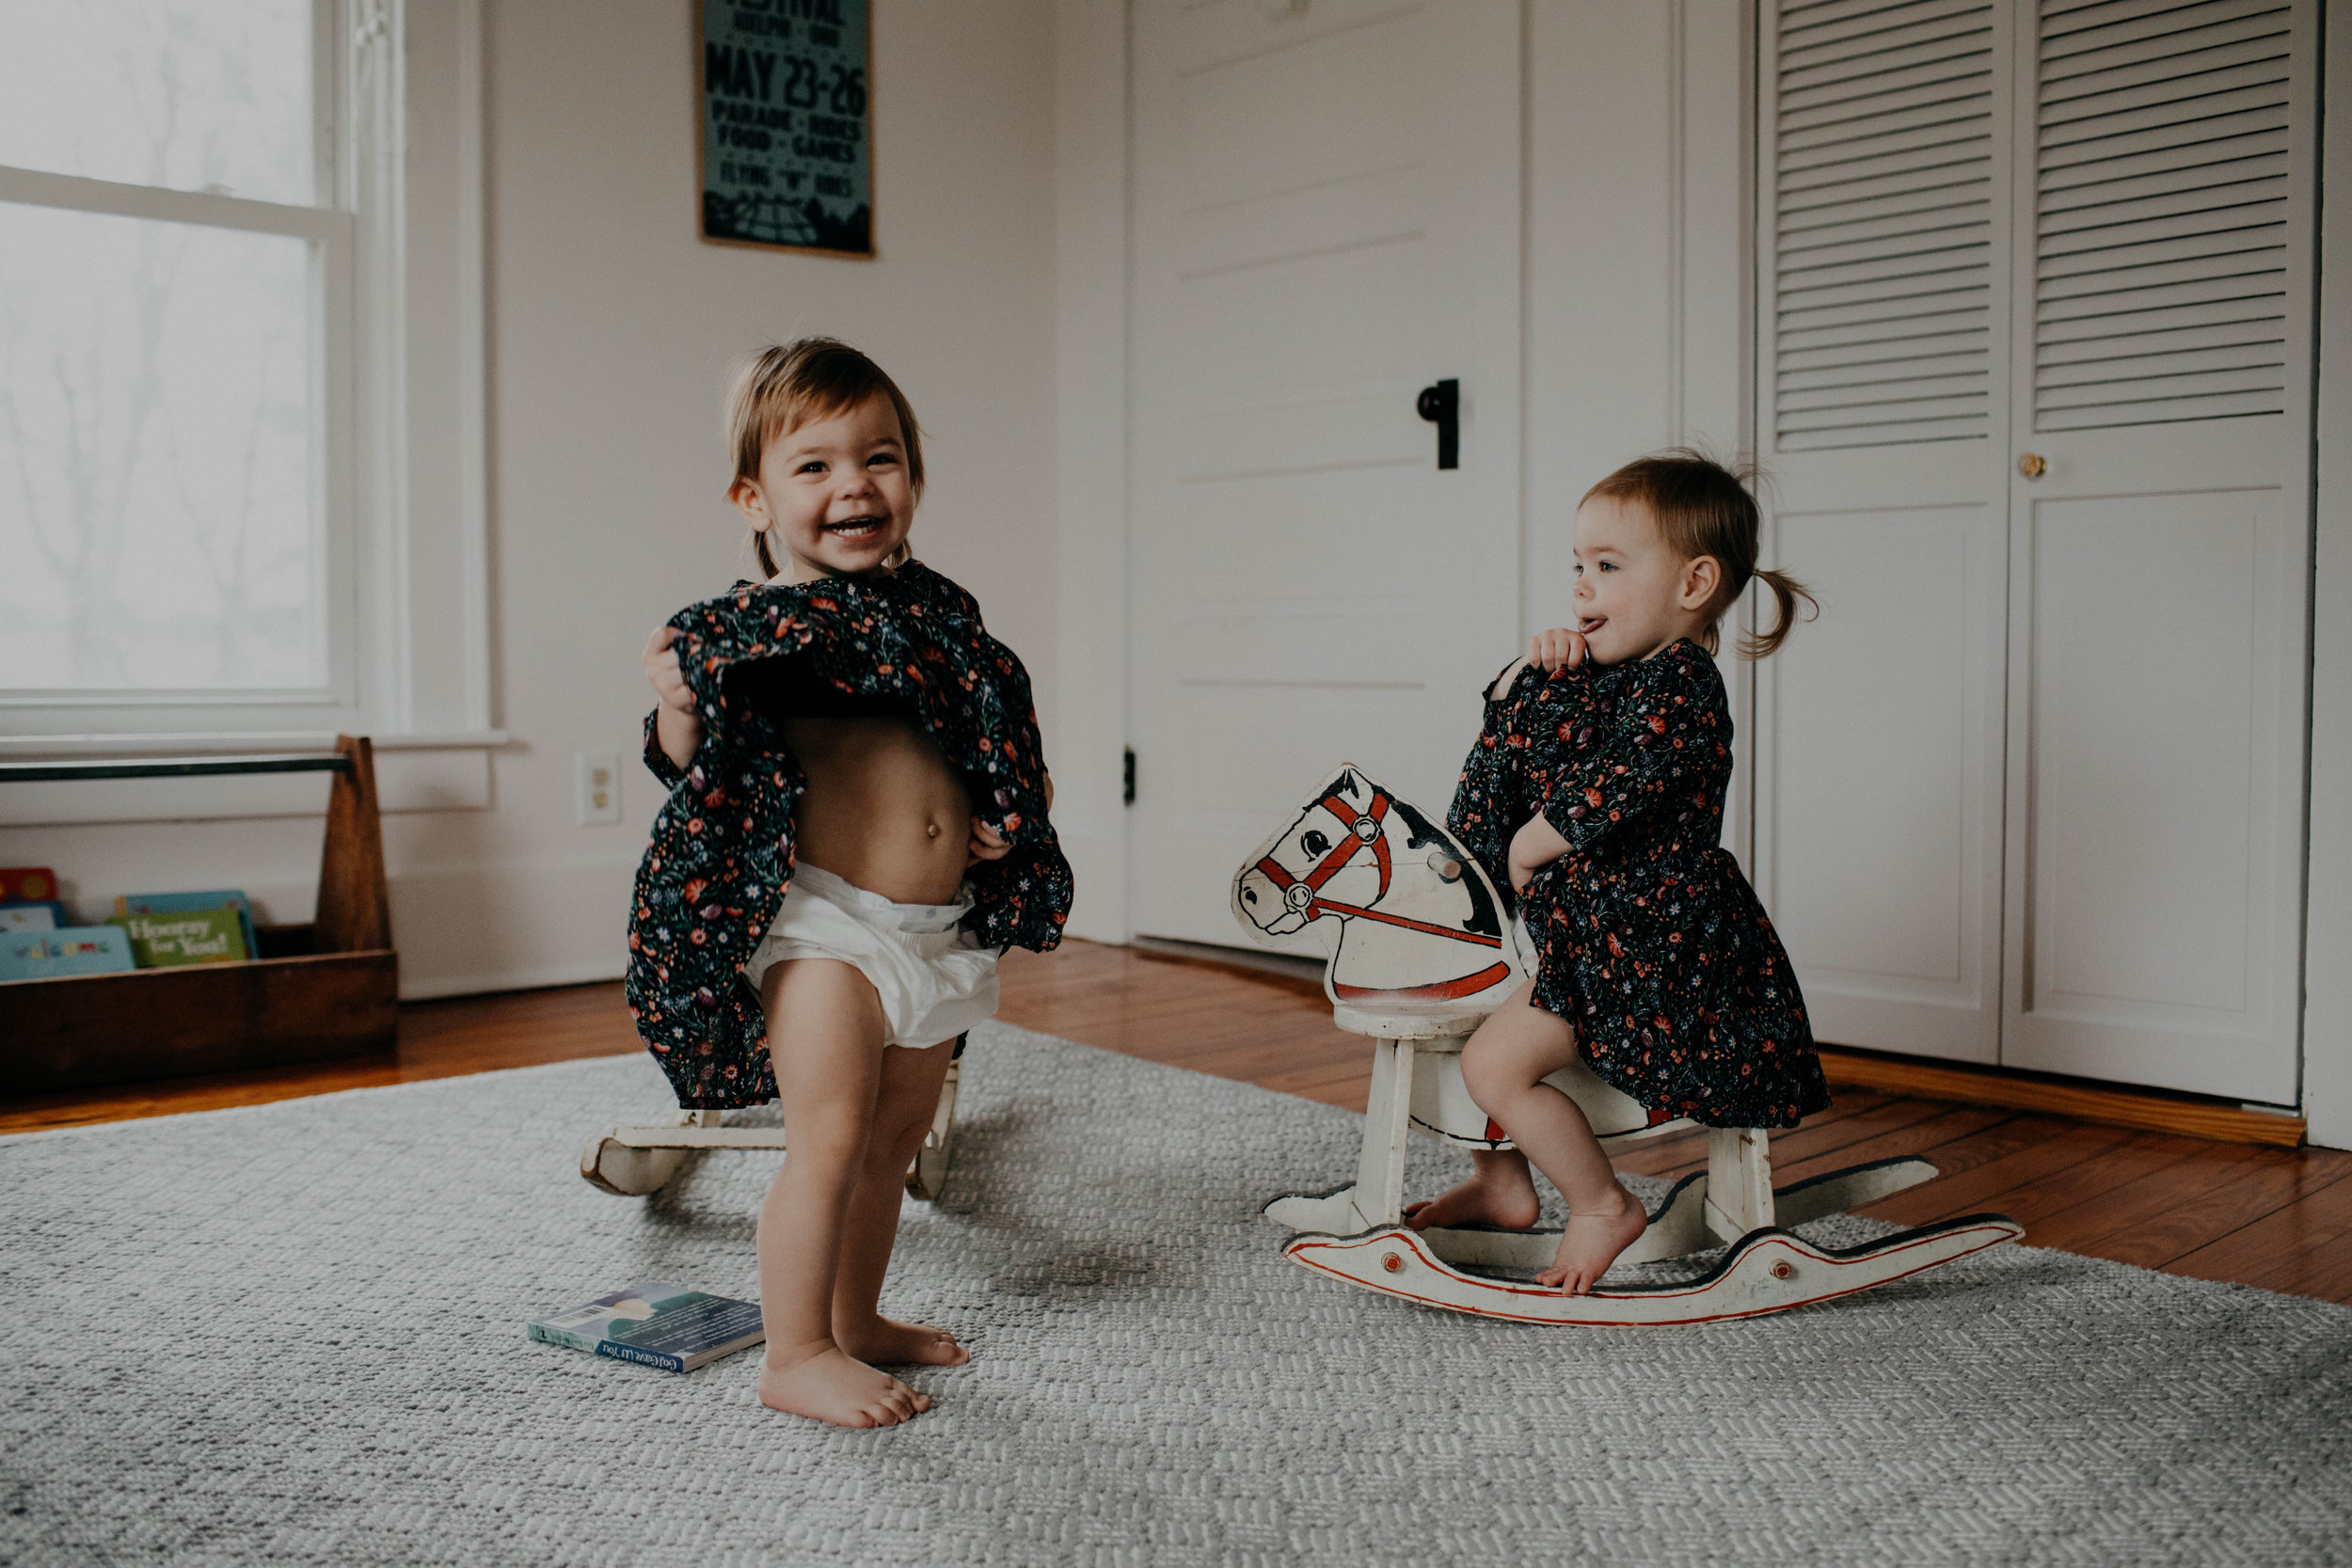 columbus ohio lifestyle family photographer grace e jones photography14.jpg